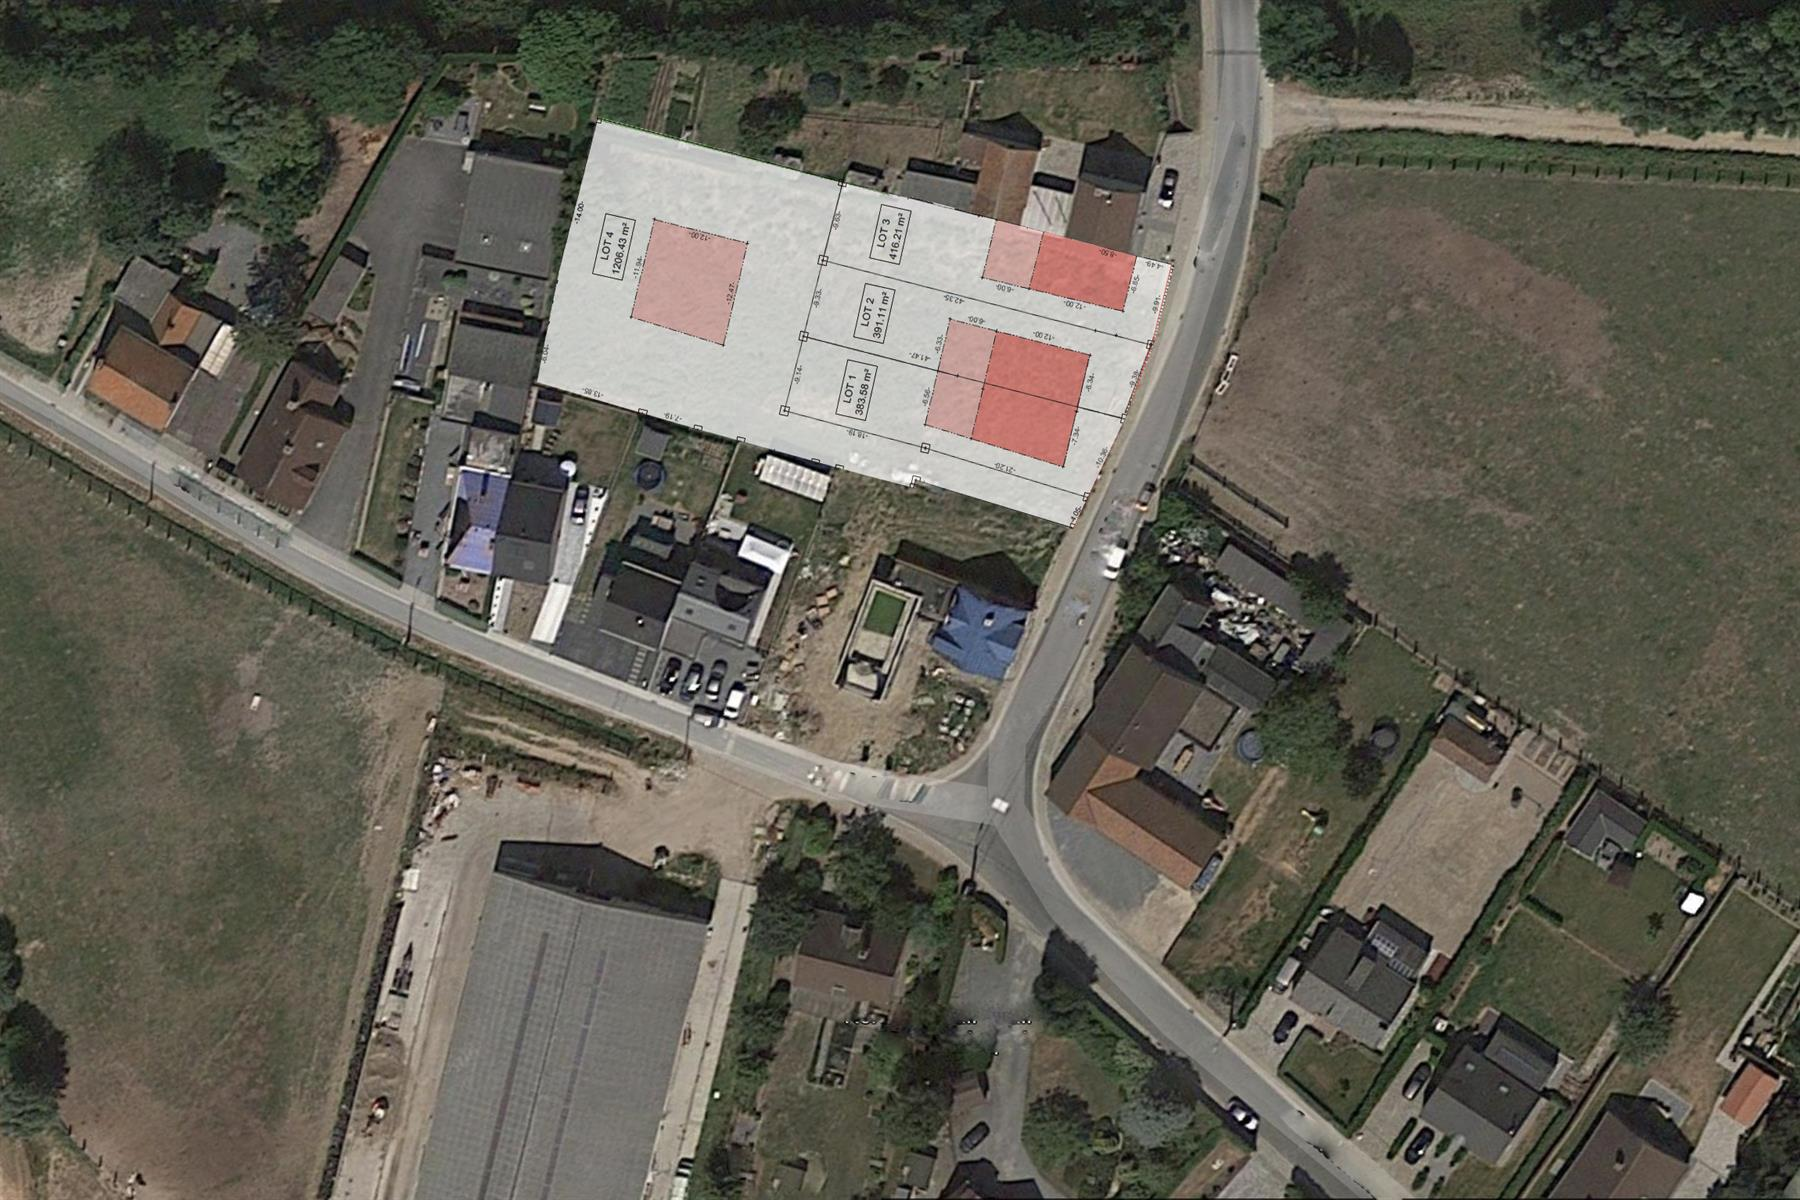 Rustig gelegen bouwgrond voor HOB te Oordegem 416m2